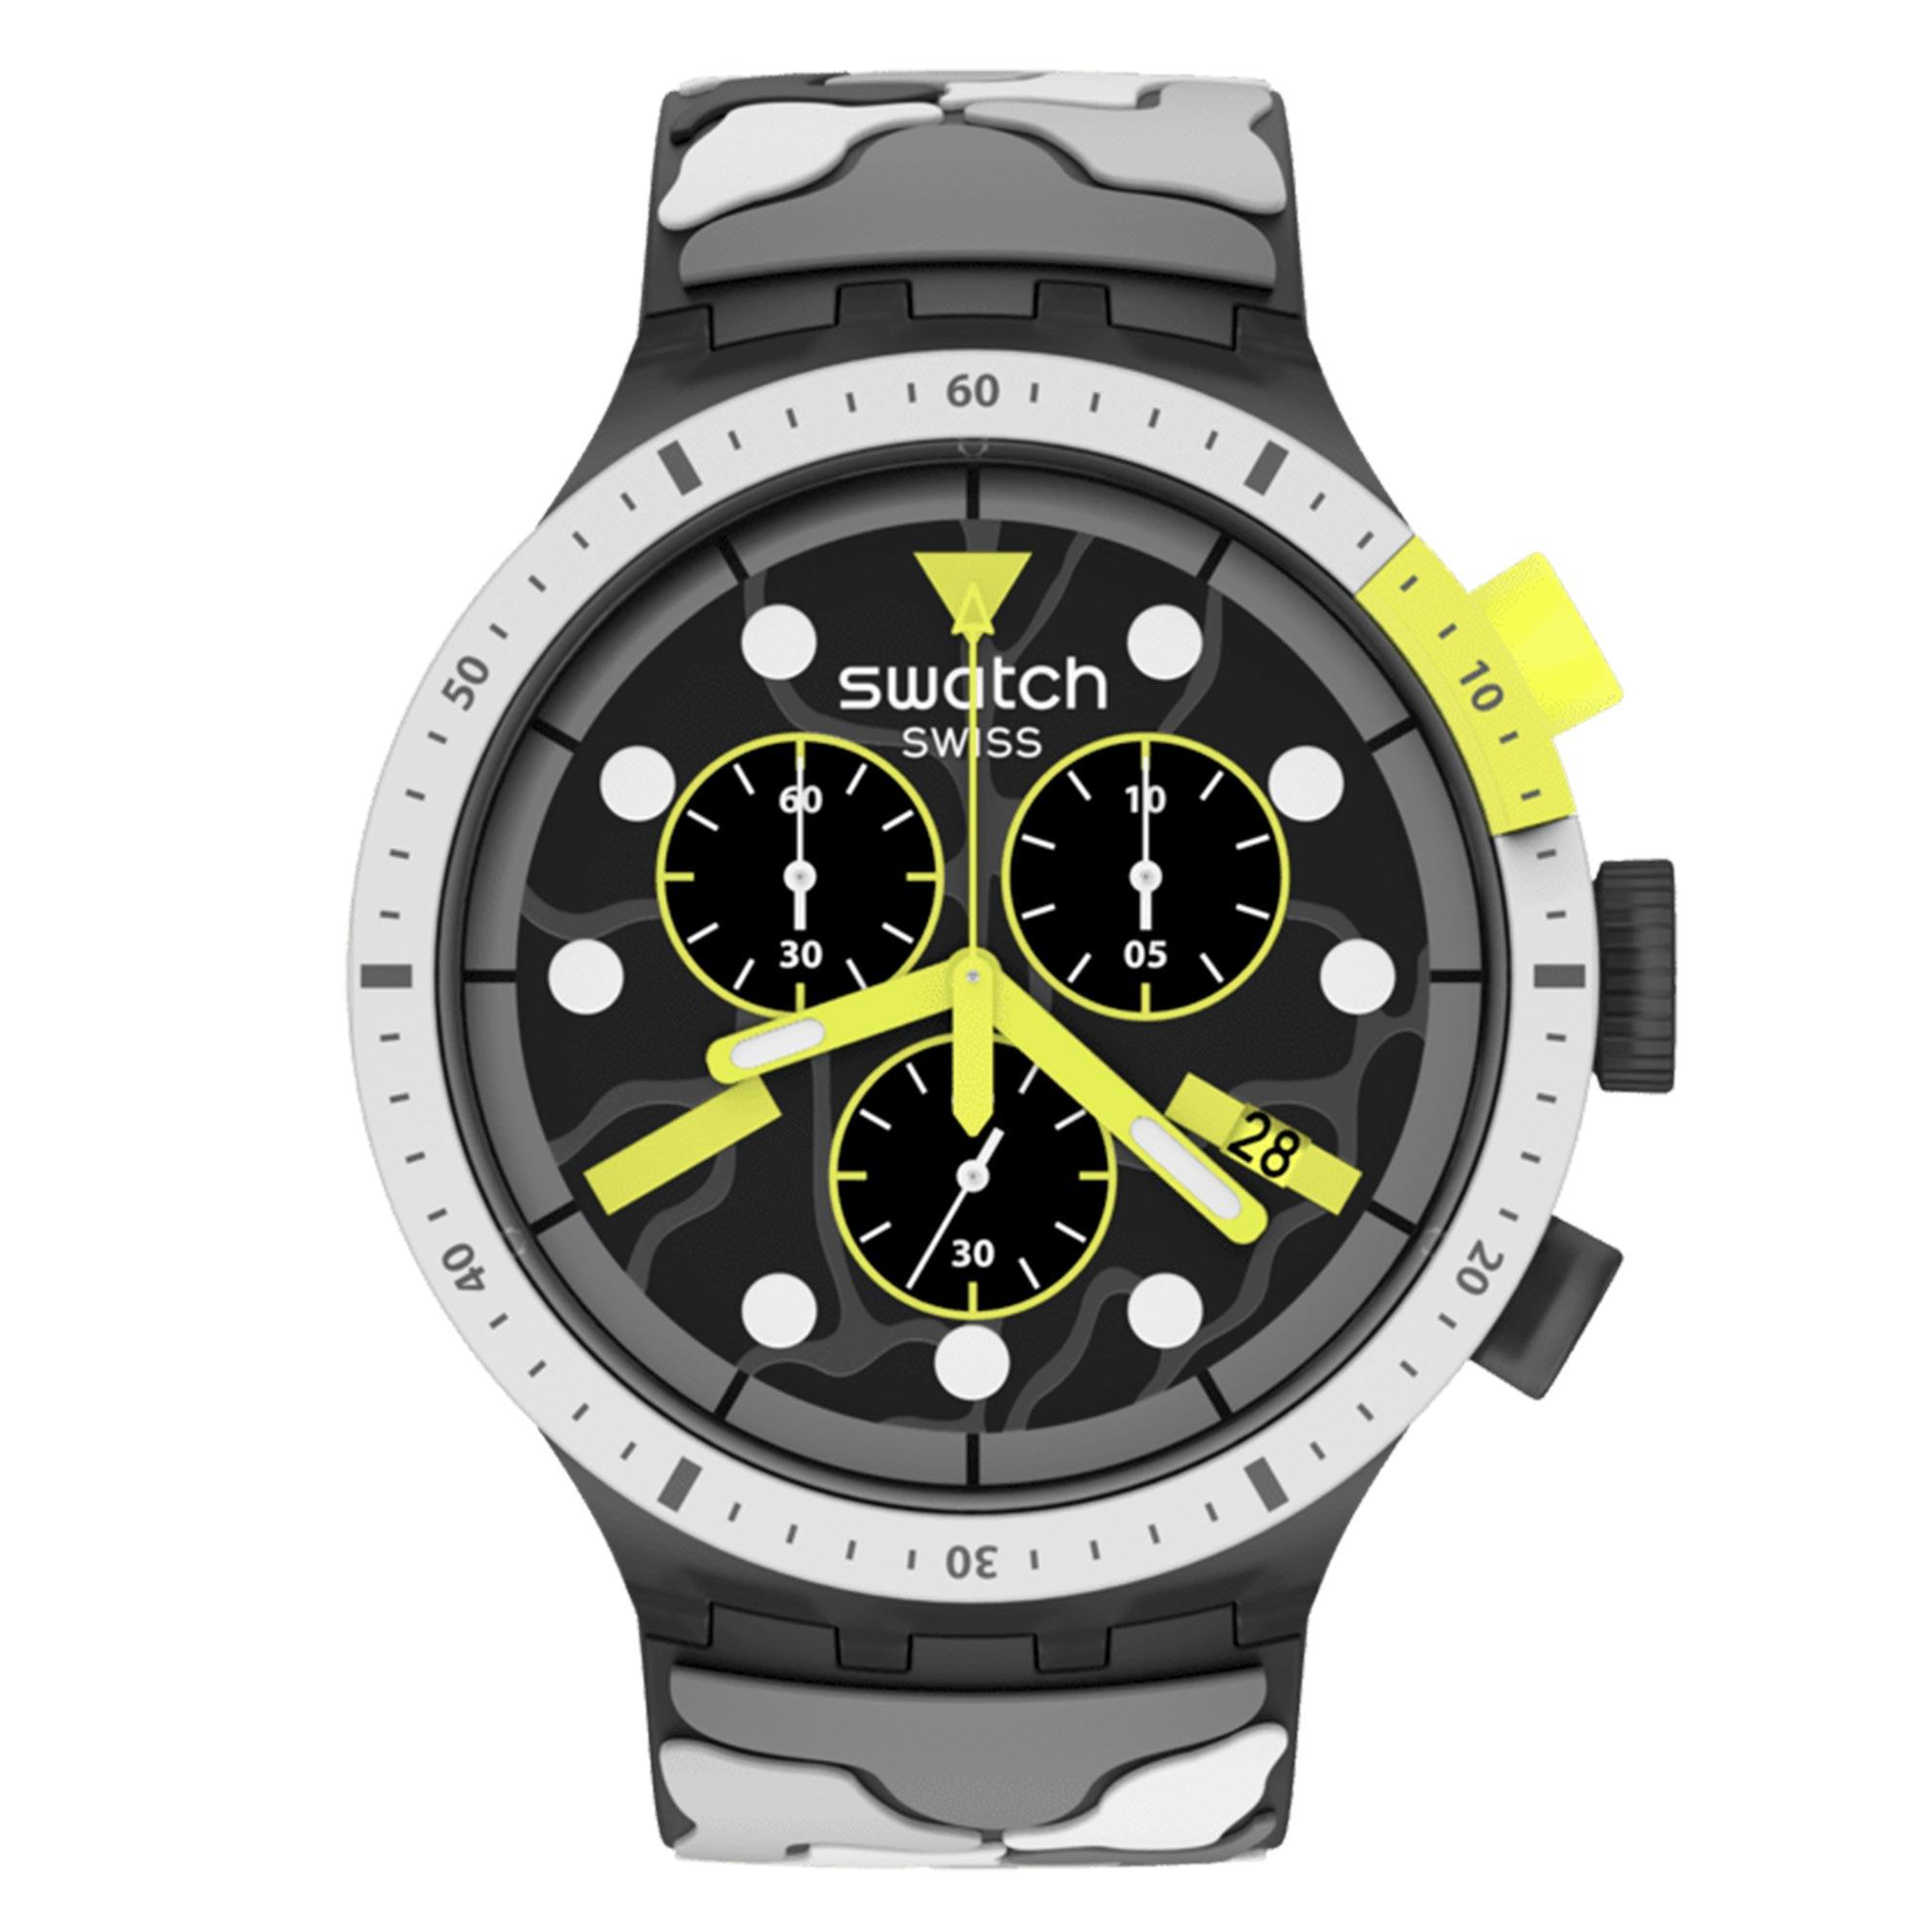 Swatch Escape Arctic Black Dial Arctic Pattern Silicone Strap Men's Watch SB02M400